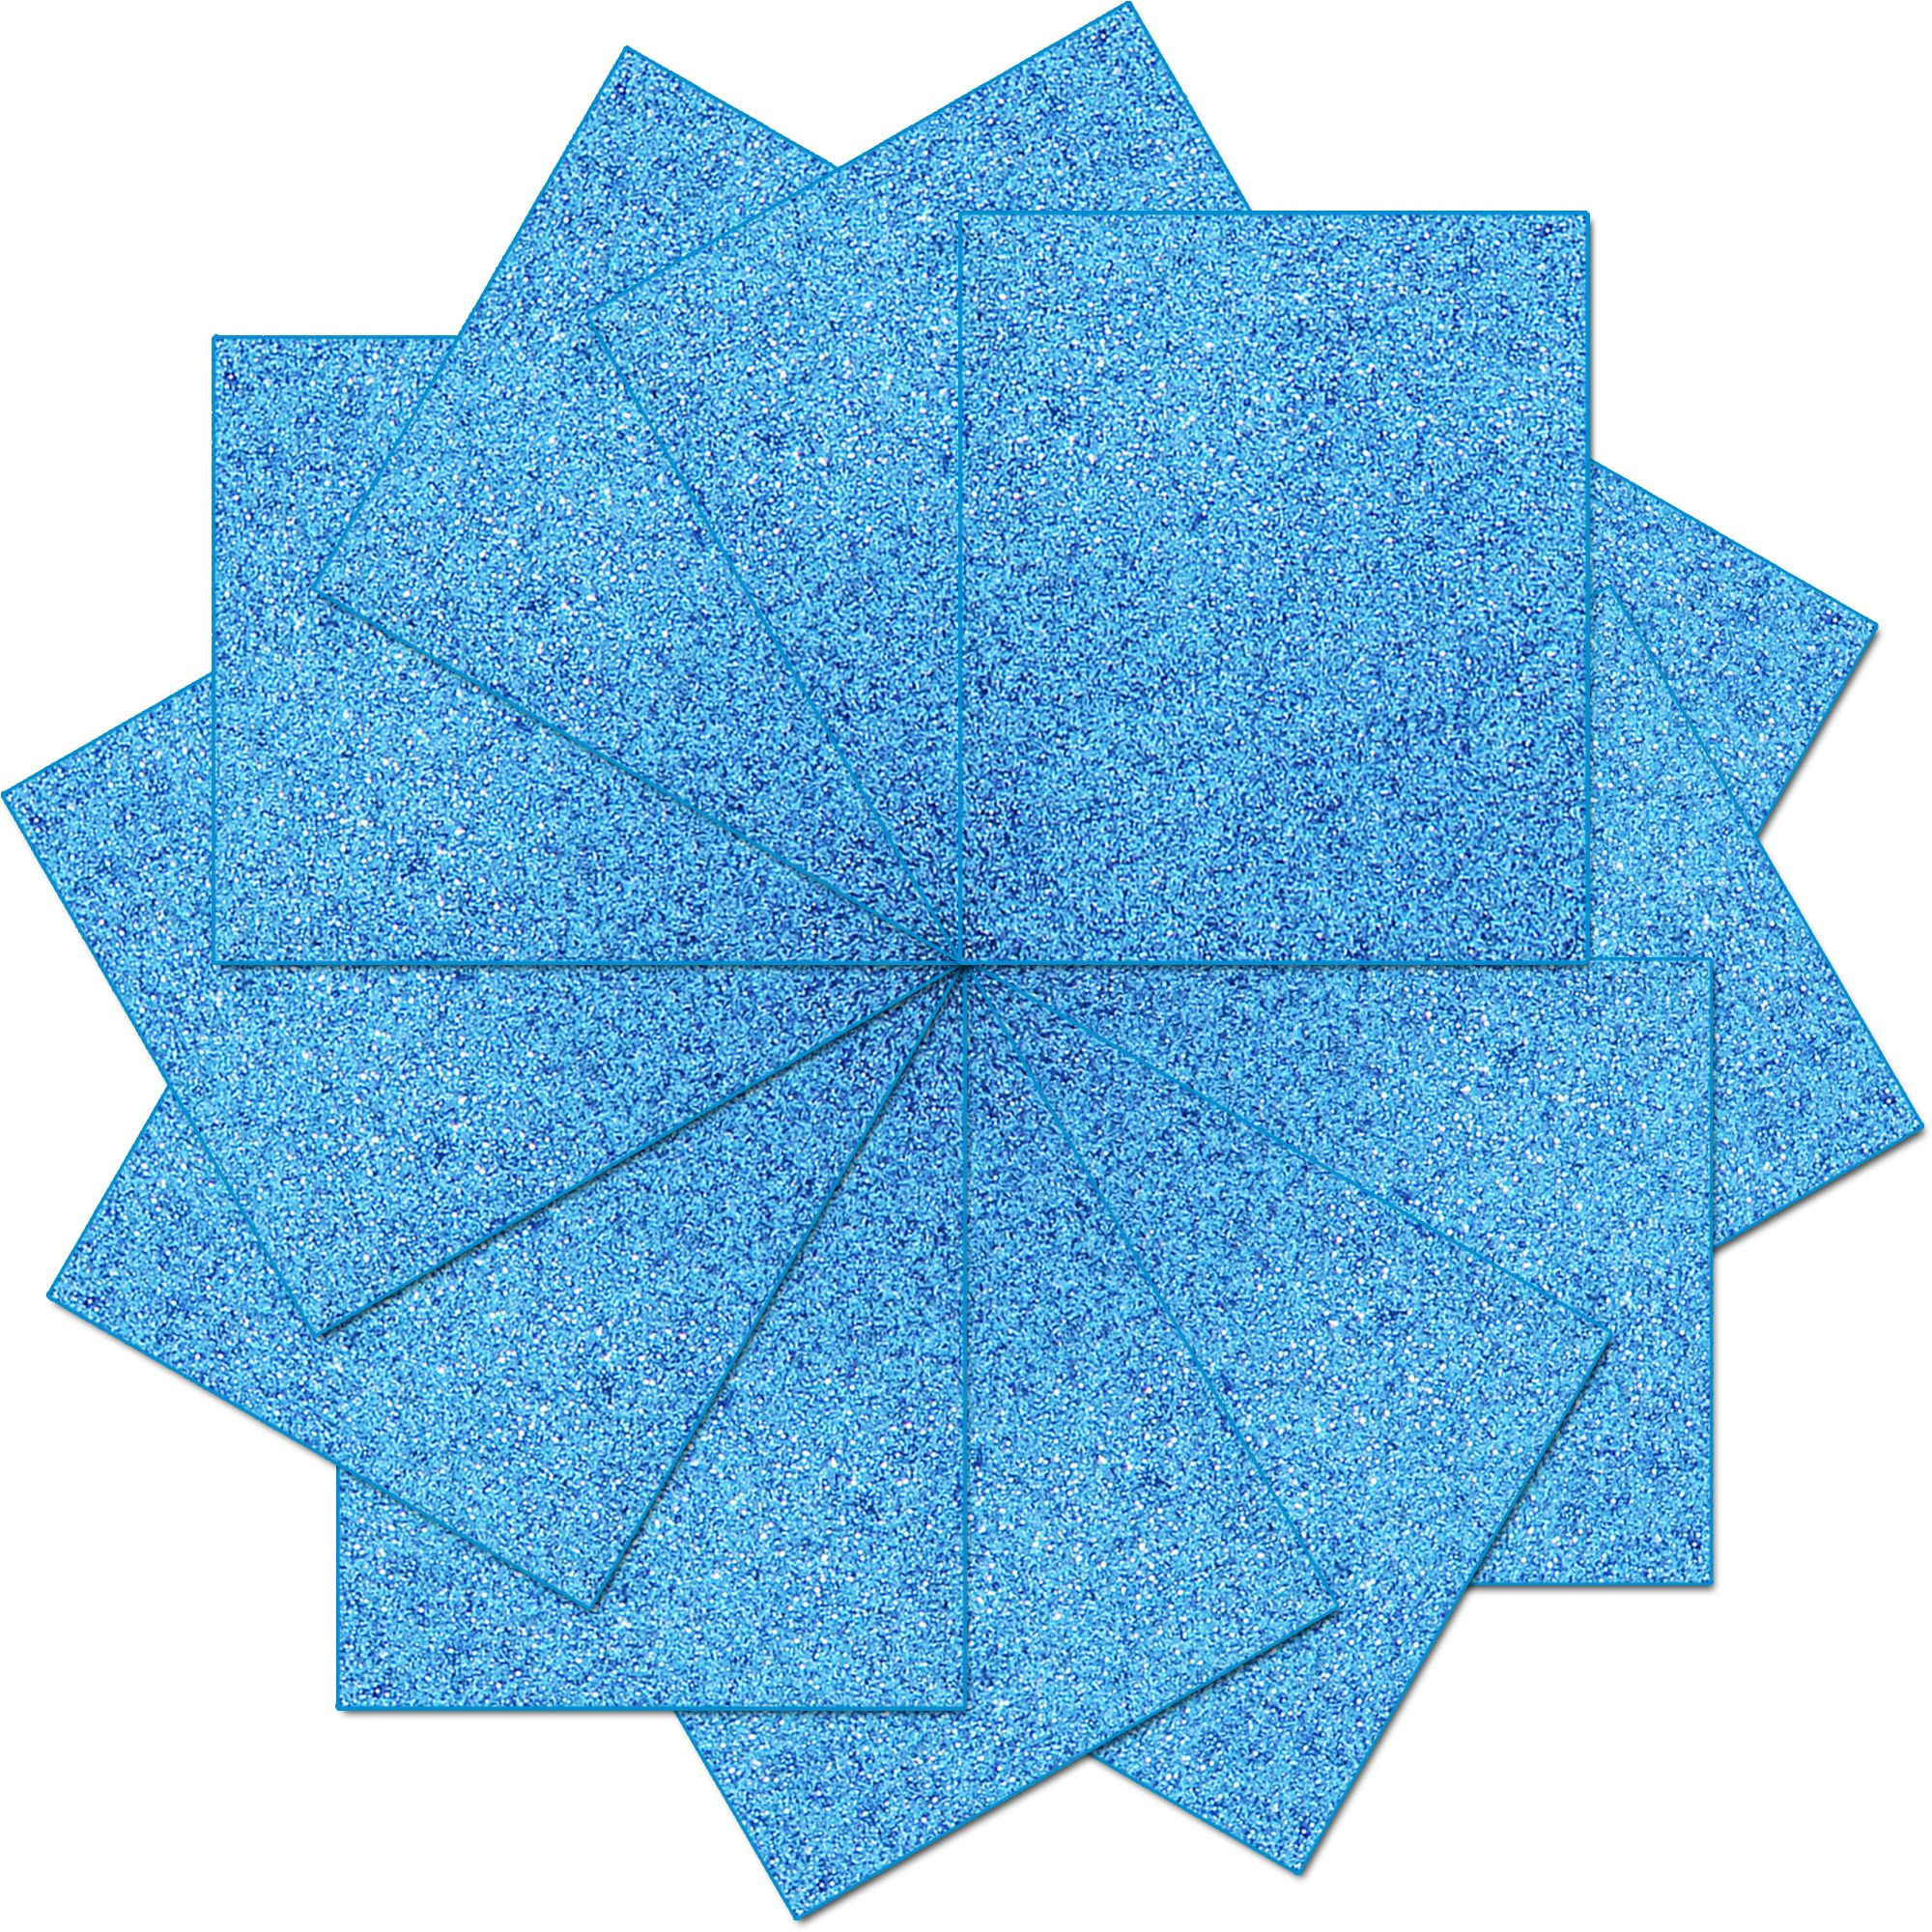 "Threadart Rainbow Colors 10"" x 12"" Glitter Heat Transfer Vinyl Precut Sheets | Red Green Blue Yellow Pink & Copper Sheets | Glitter Colors Bundle Pack | For Silhouette Cameo Cricut |HTV"